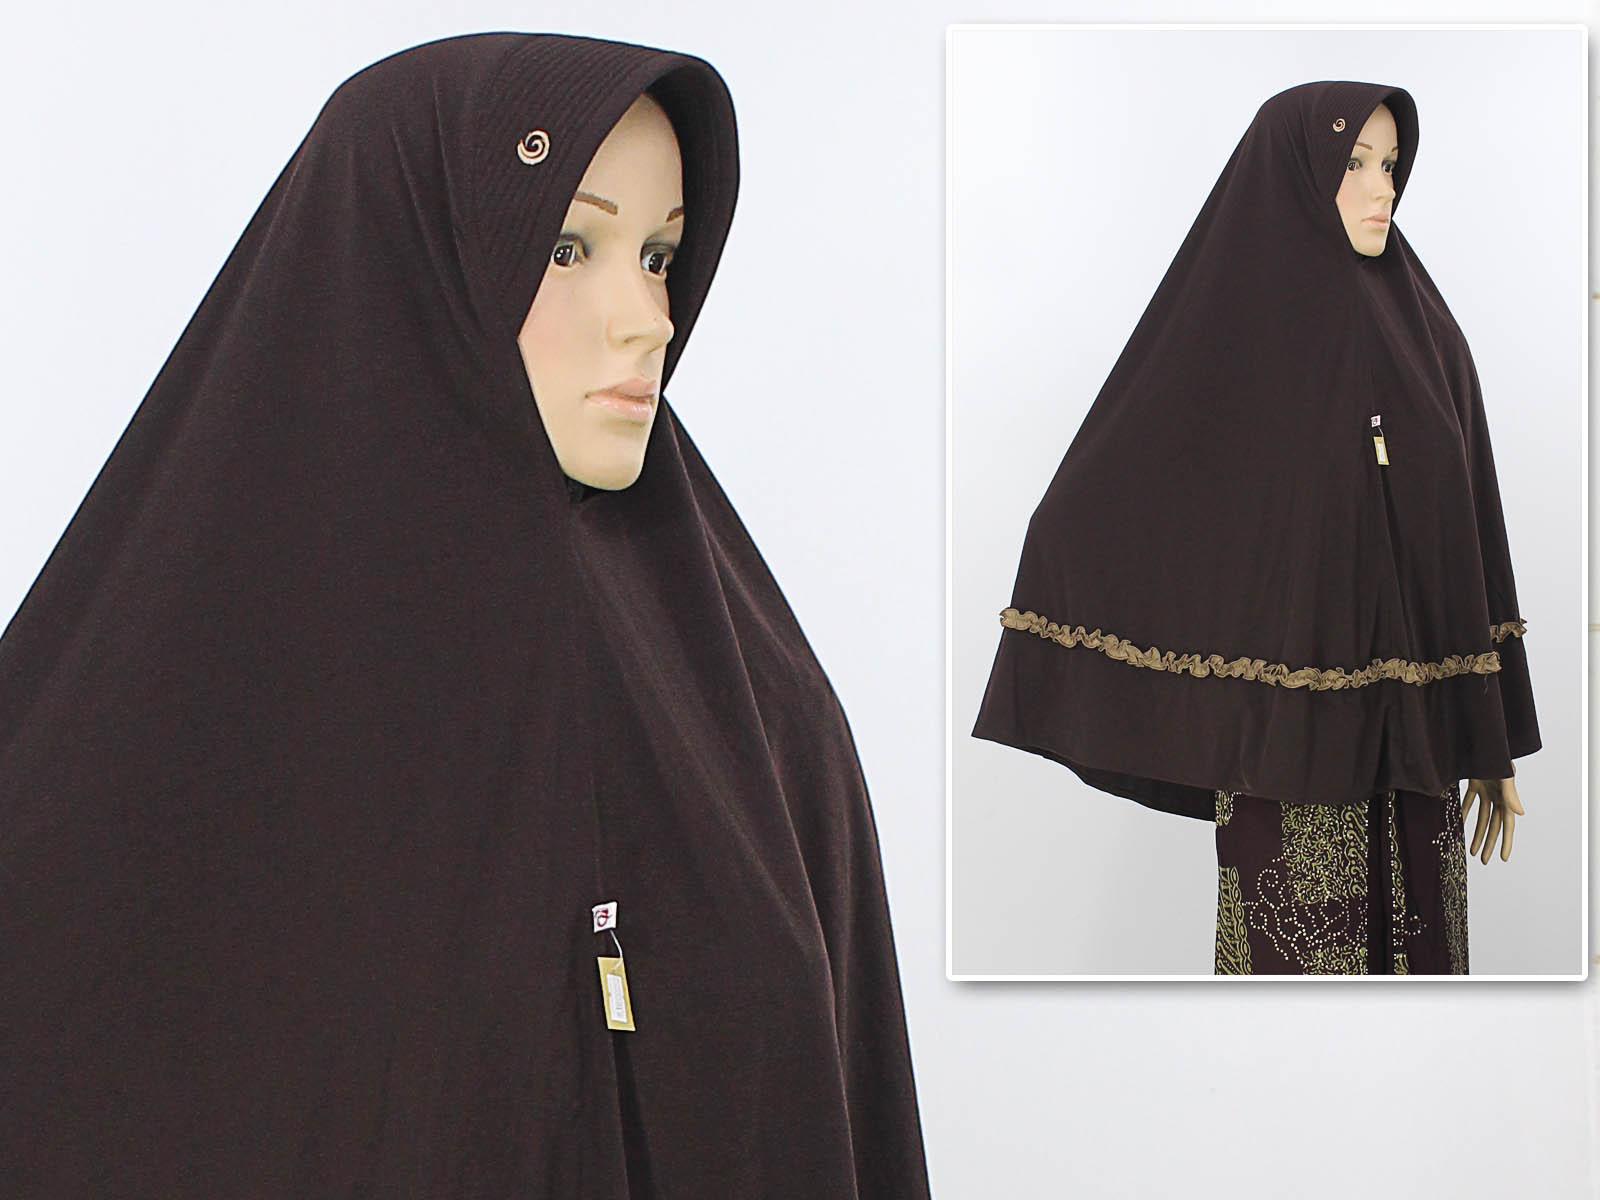 Grosir Kerudung Hijab / Jilbab Murah